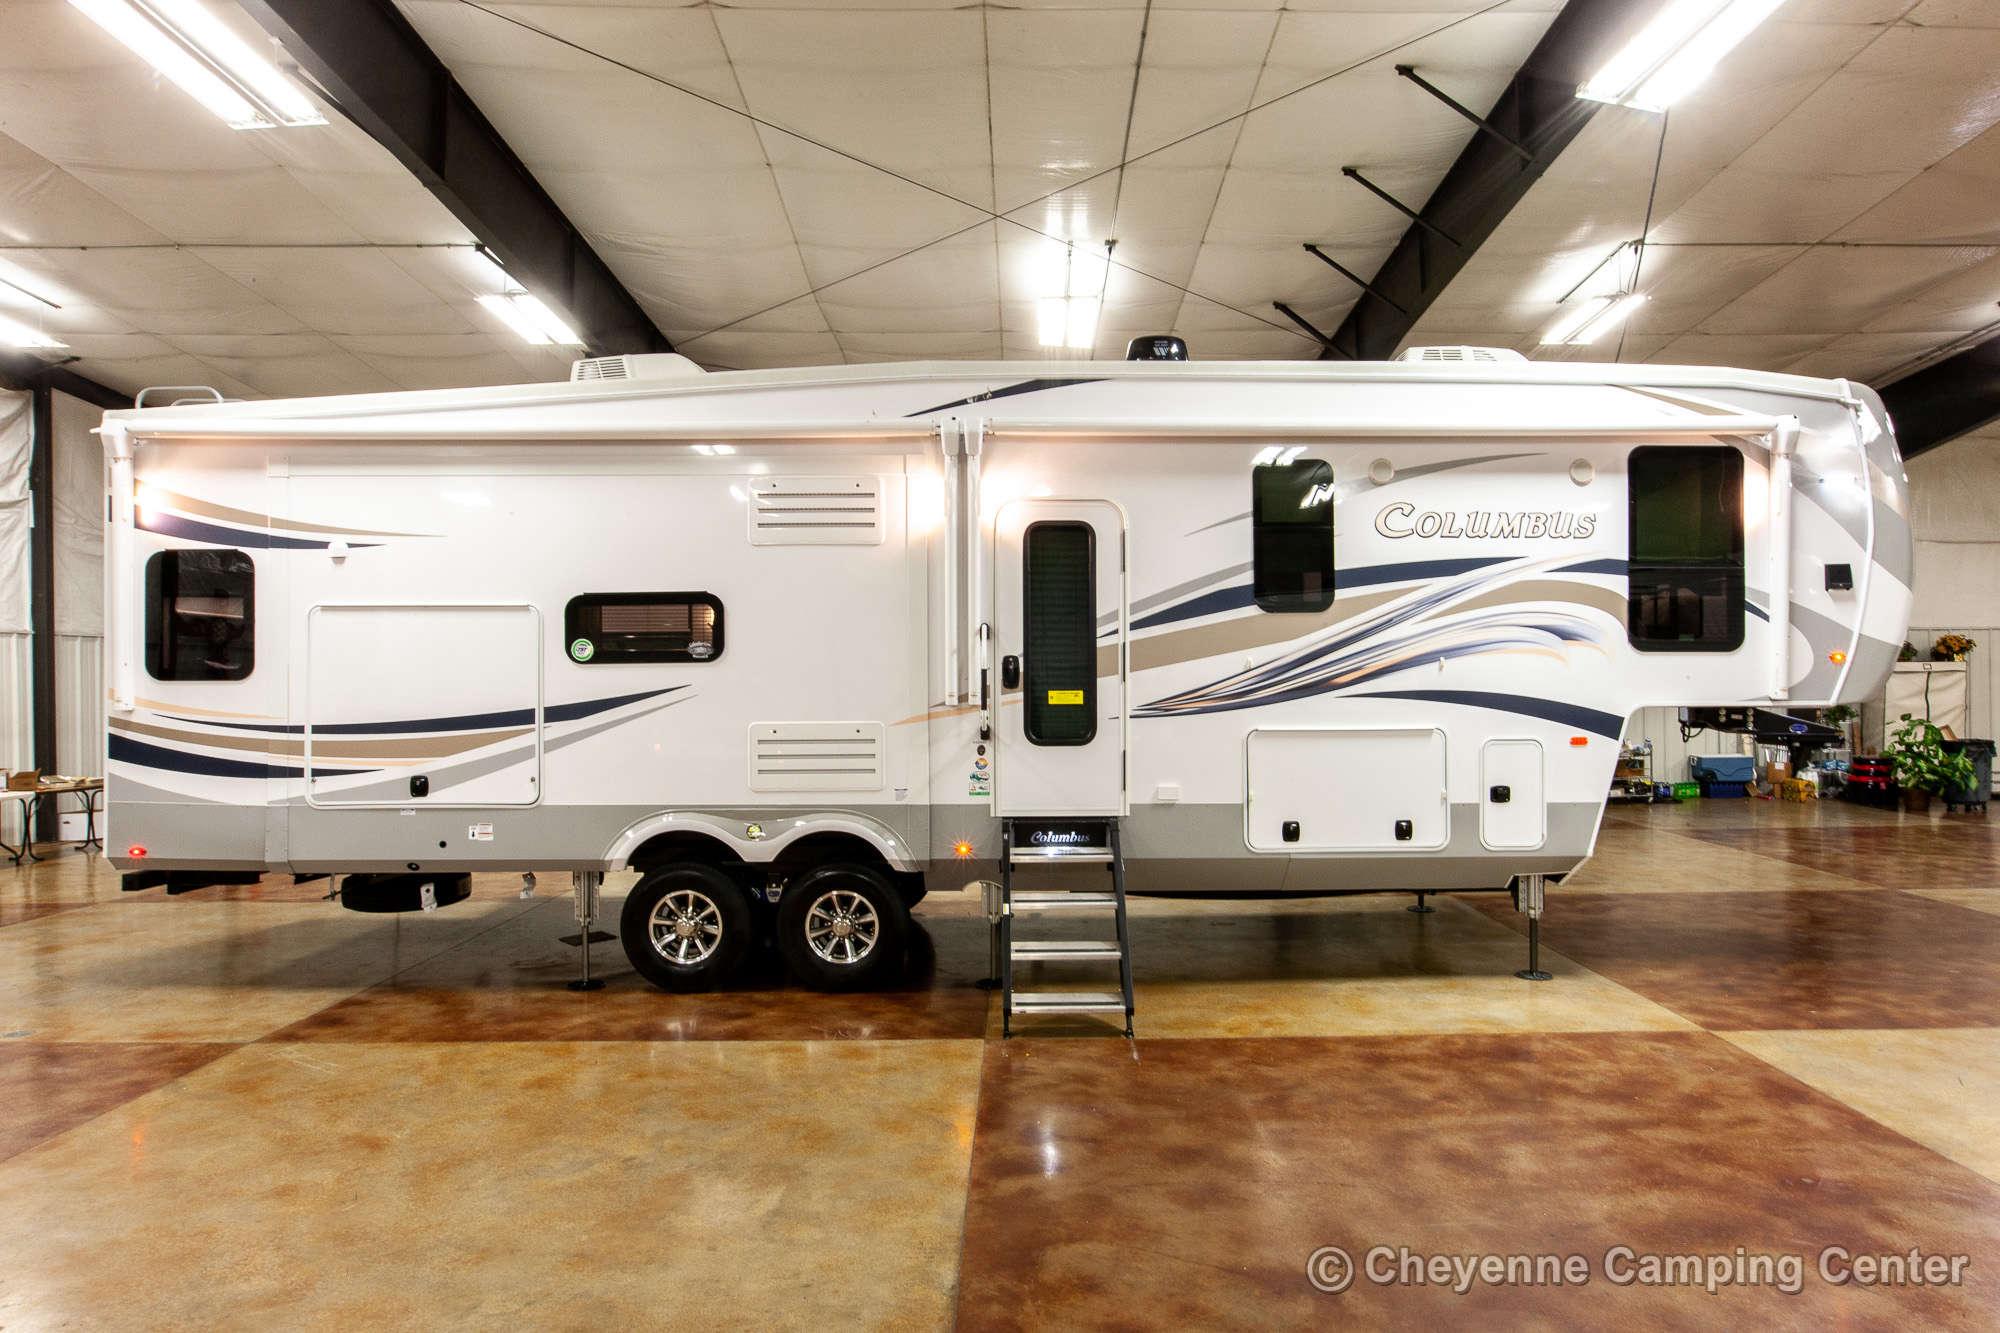 2020 Palomino Columbus 328RL Fifth Wheel Exterior Image